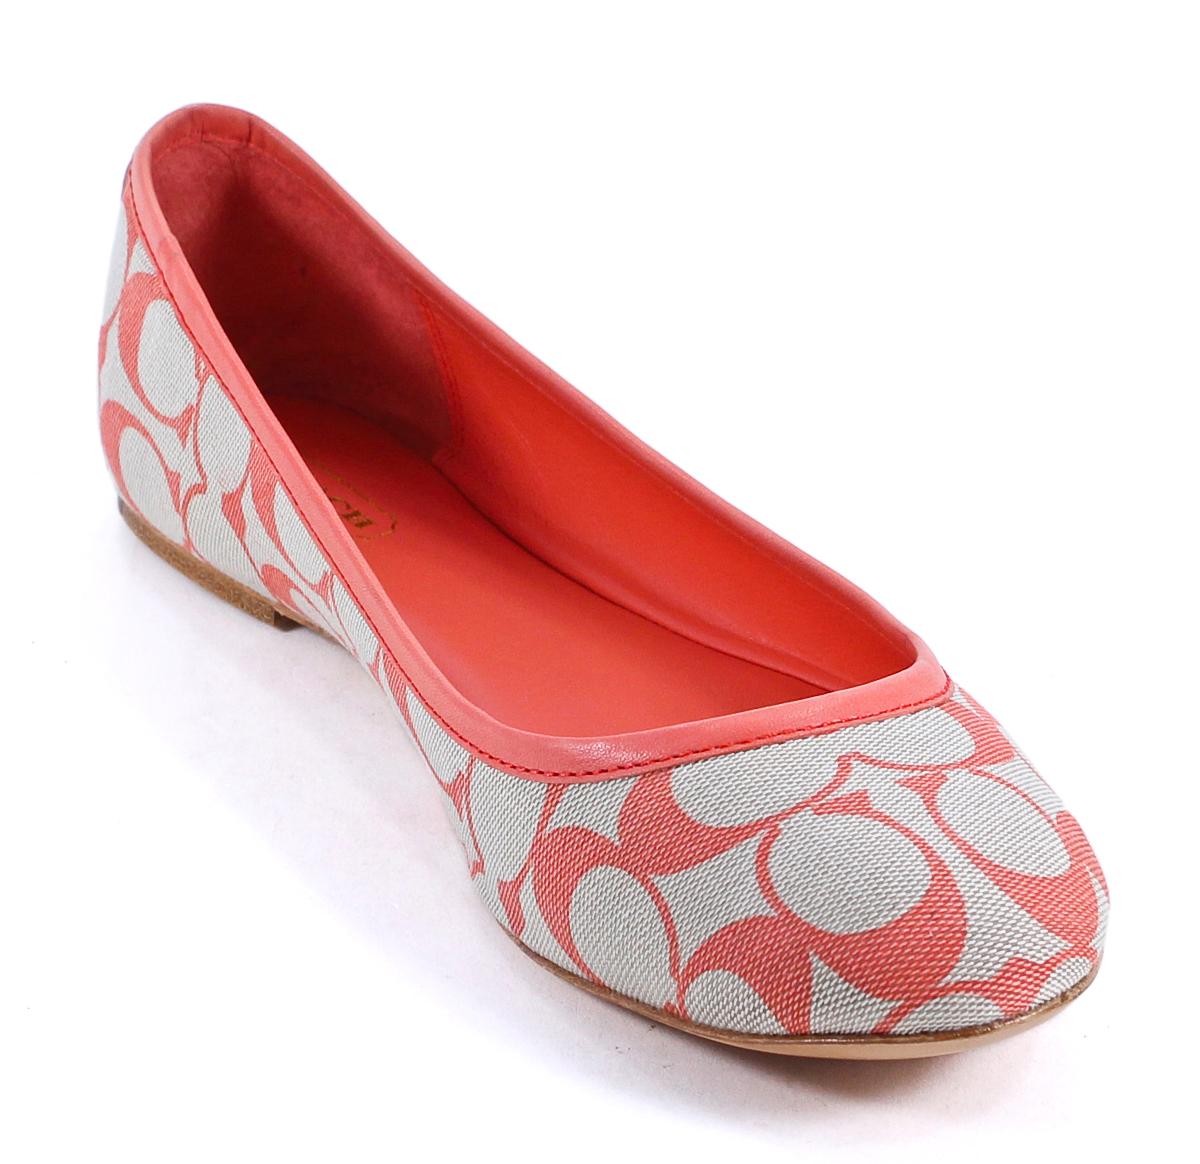 coach signature sun orange august flat slip on shoes 9 new